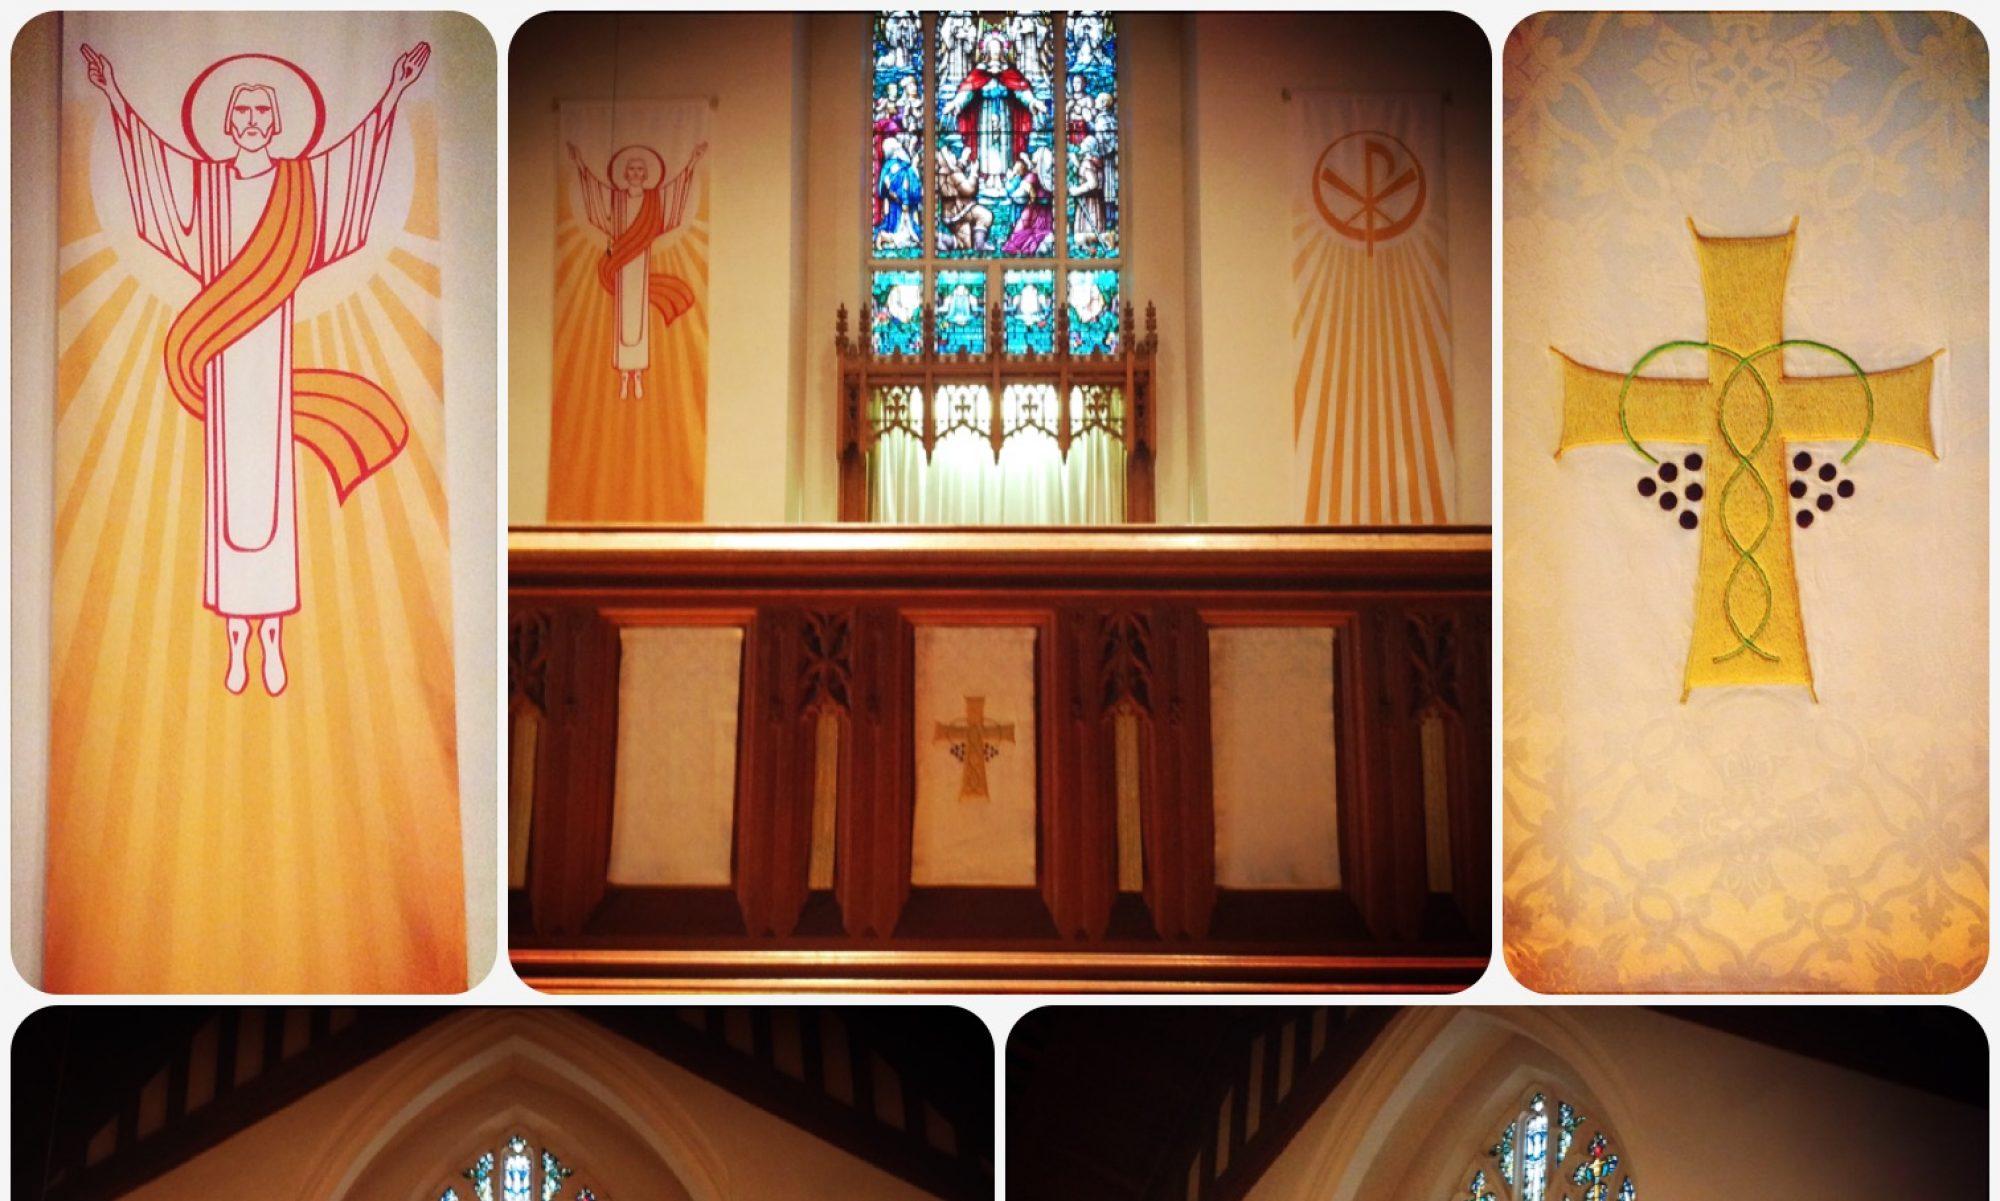 Leaside United Church